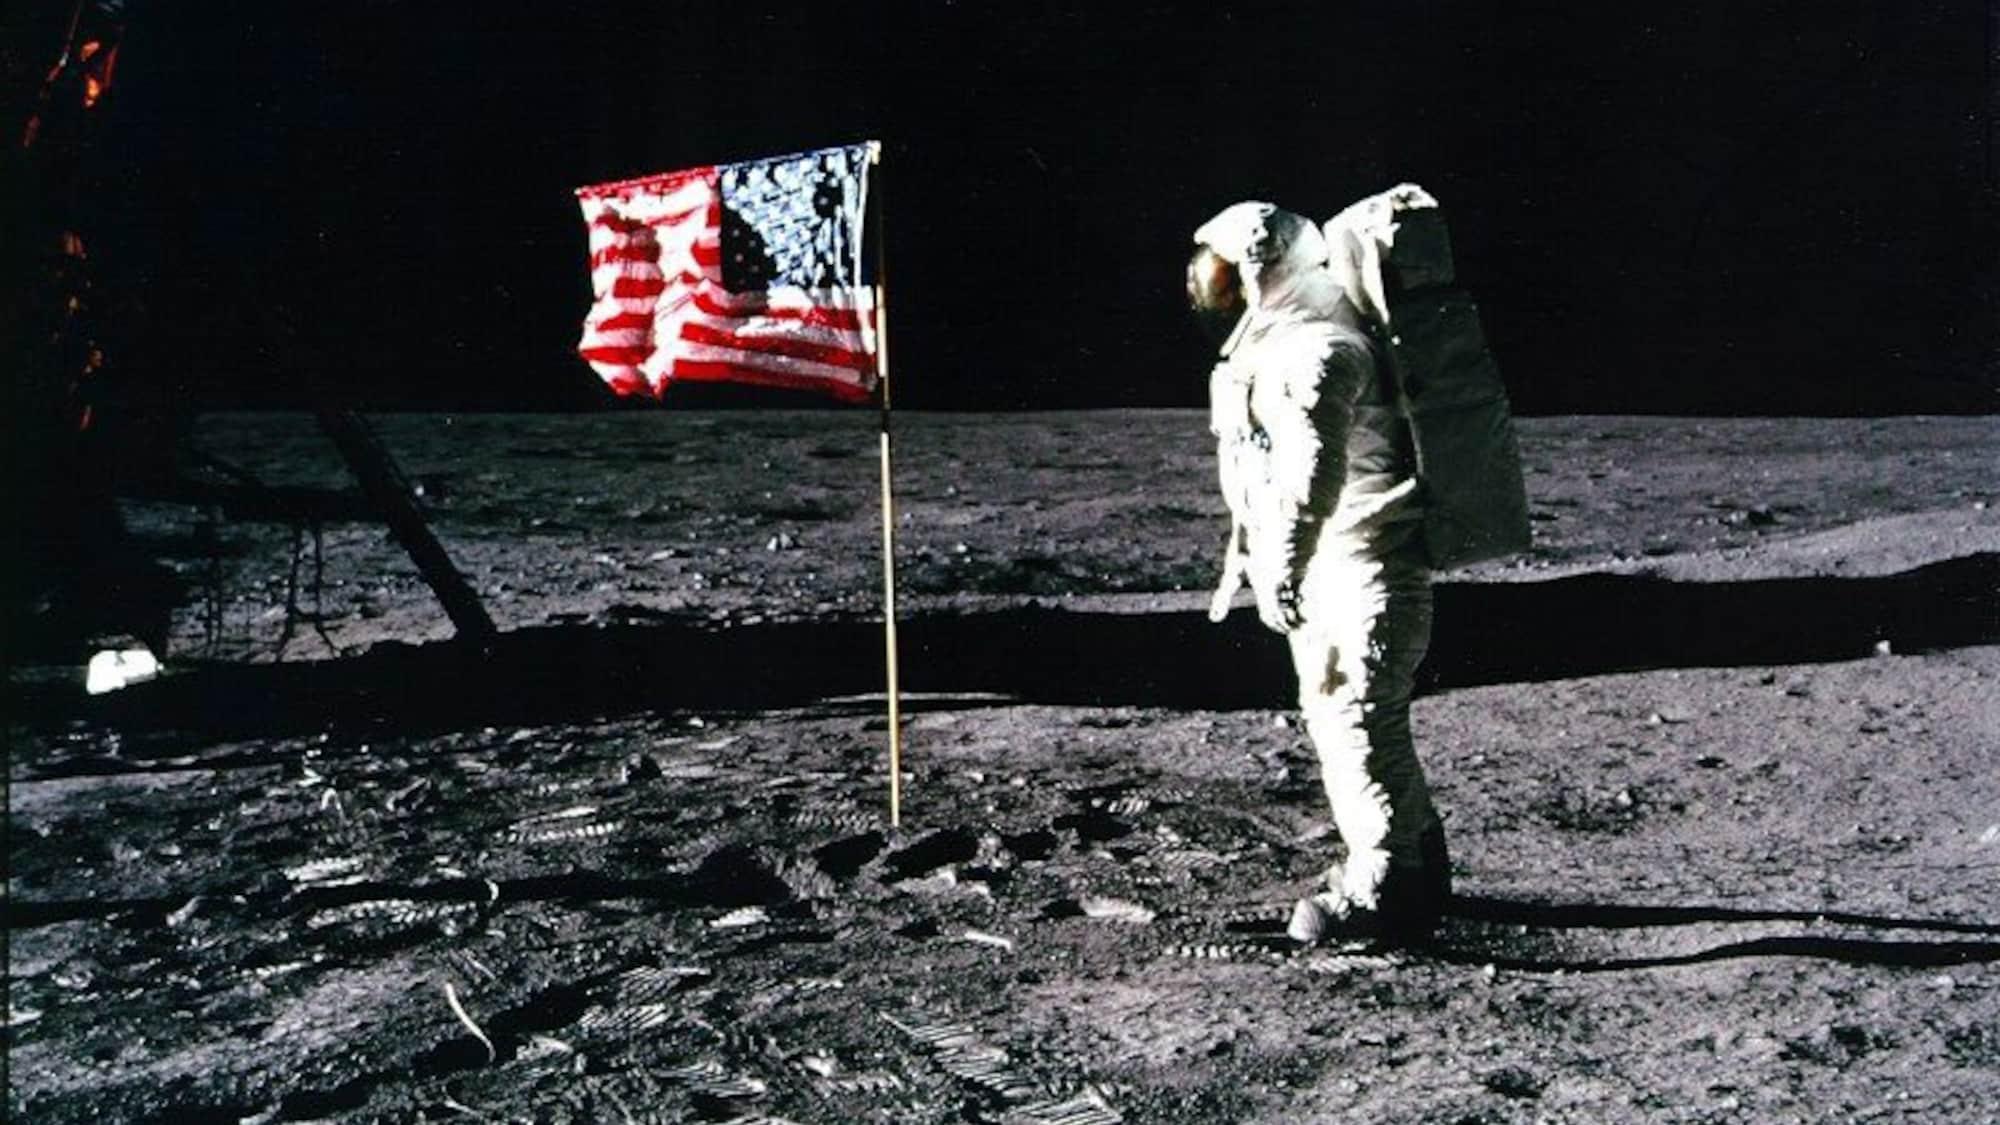 So lief die Mission ab: Tagebuch der Mondlandung